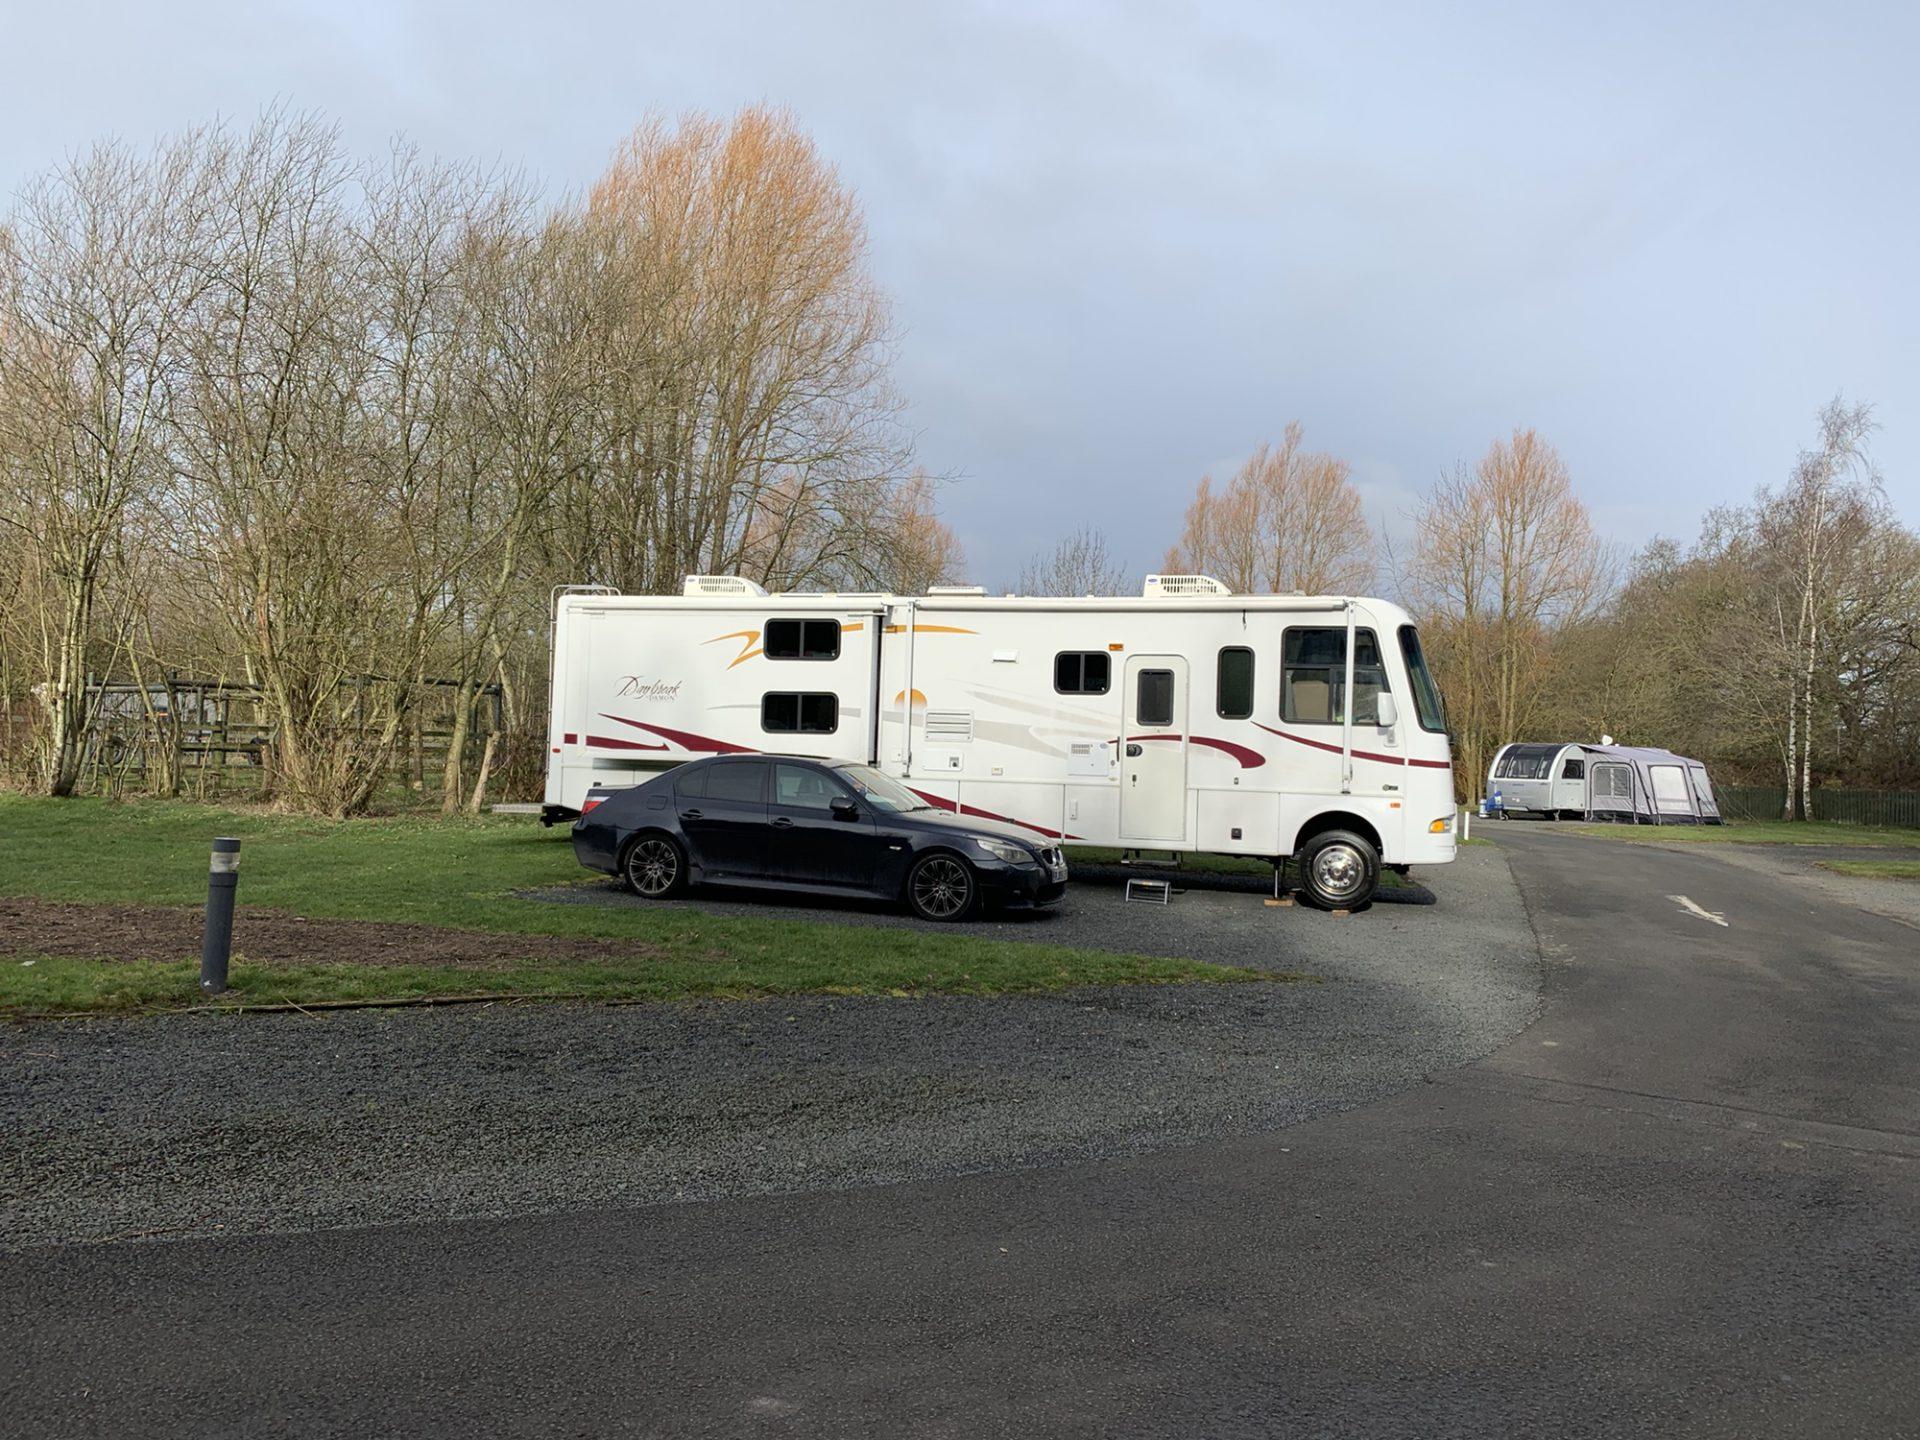 RV Life – Campsite to Campsite